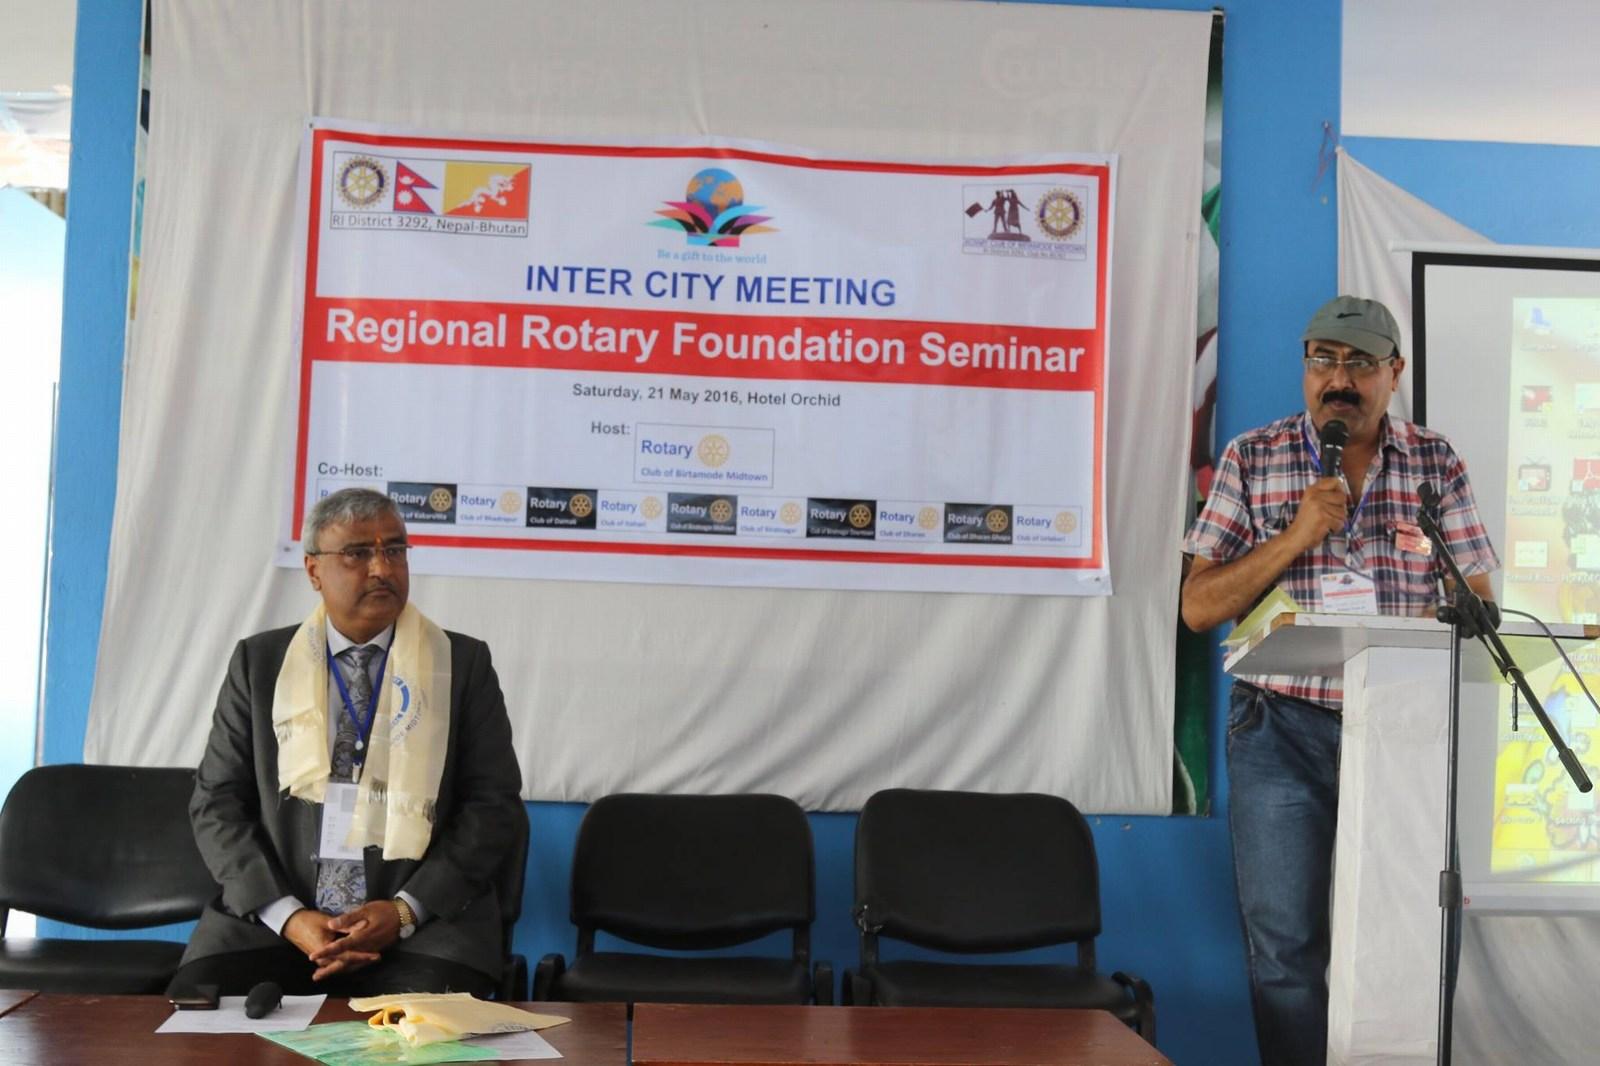 Regional-Rotary-Foundation-Seminar-Intercity-Meeting-Rotary-Club-of-Kakarvitta-22